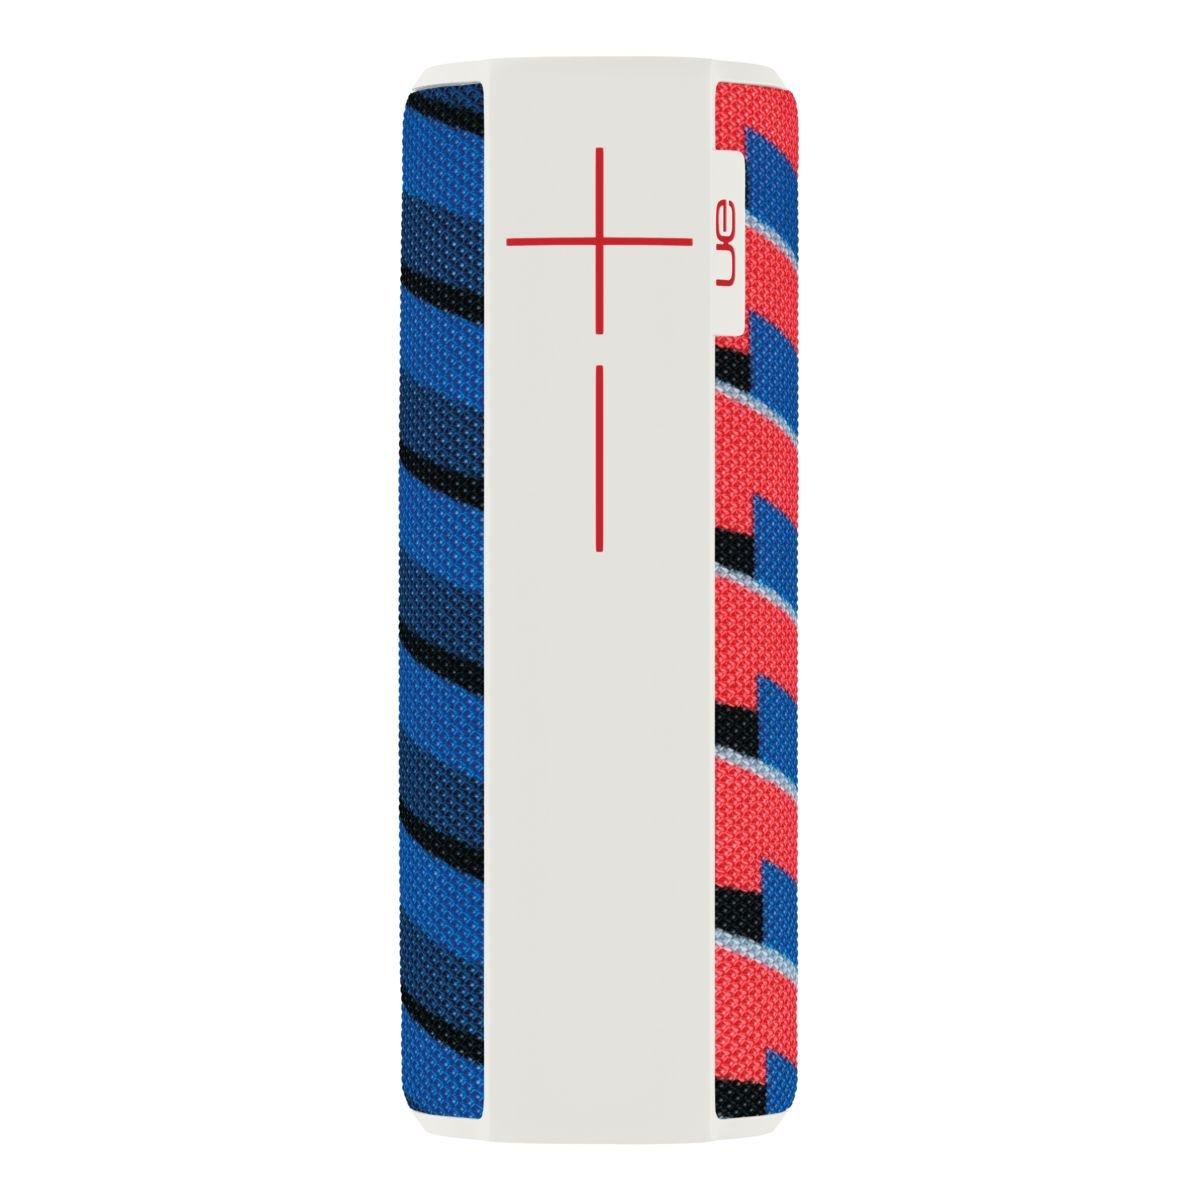 Ultimate Ears MEGABOOM Bluetooth Lautsprecher rot/blau/weiß